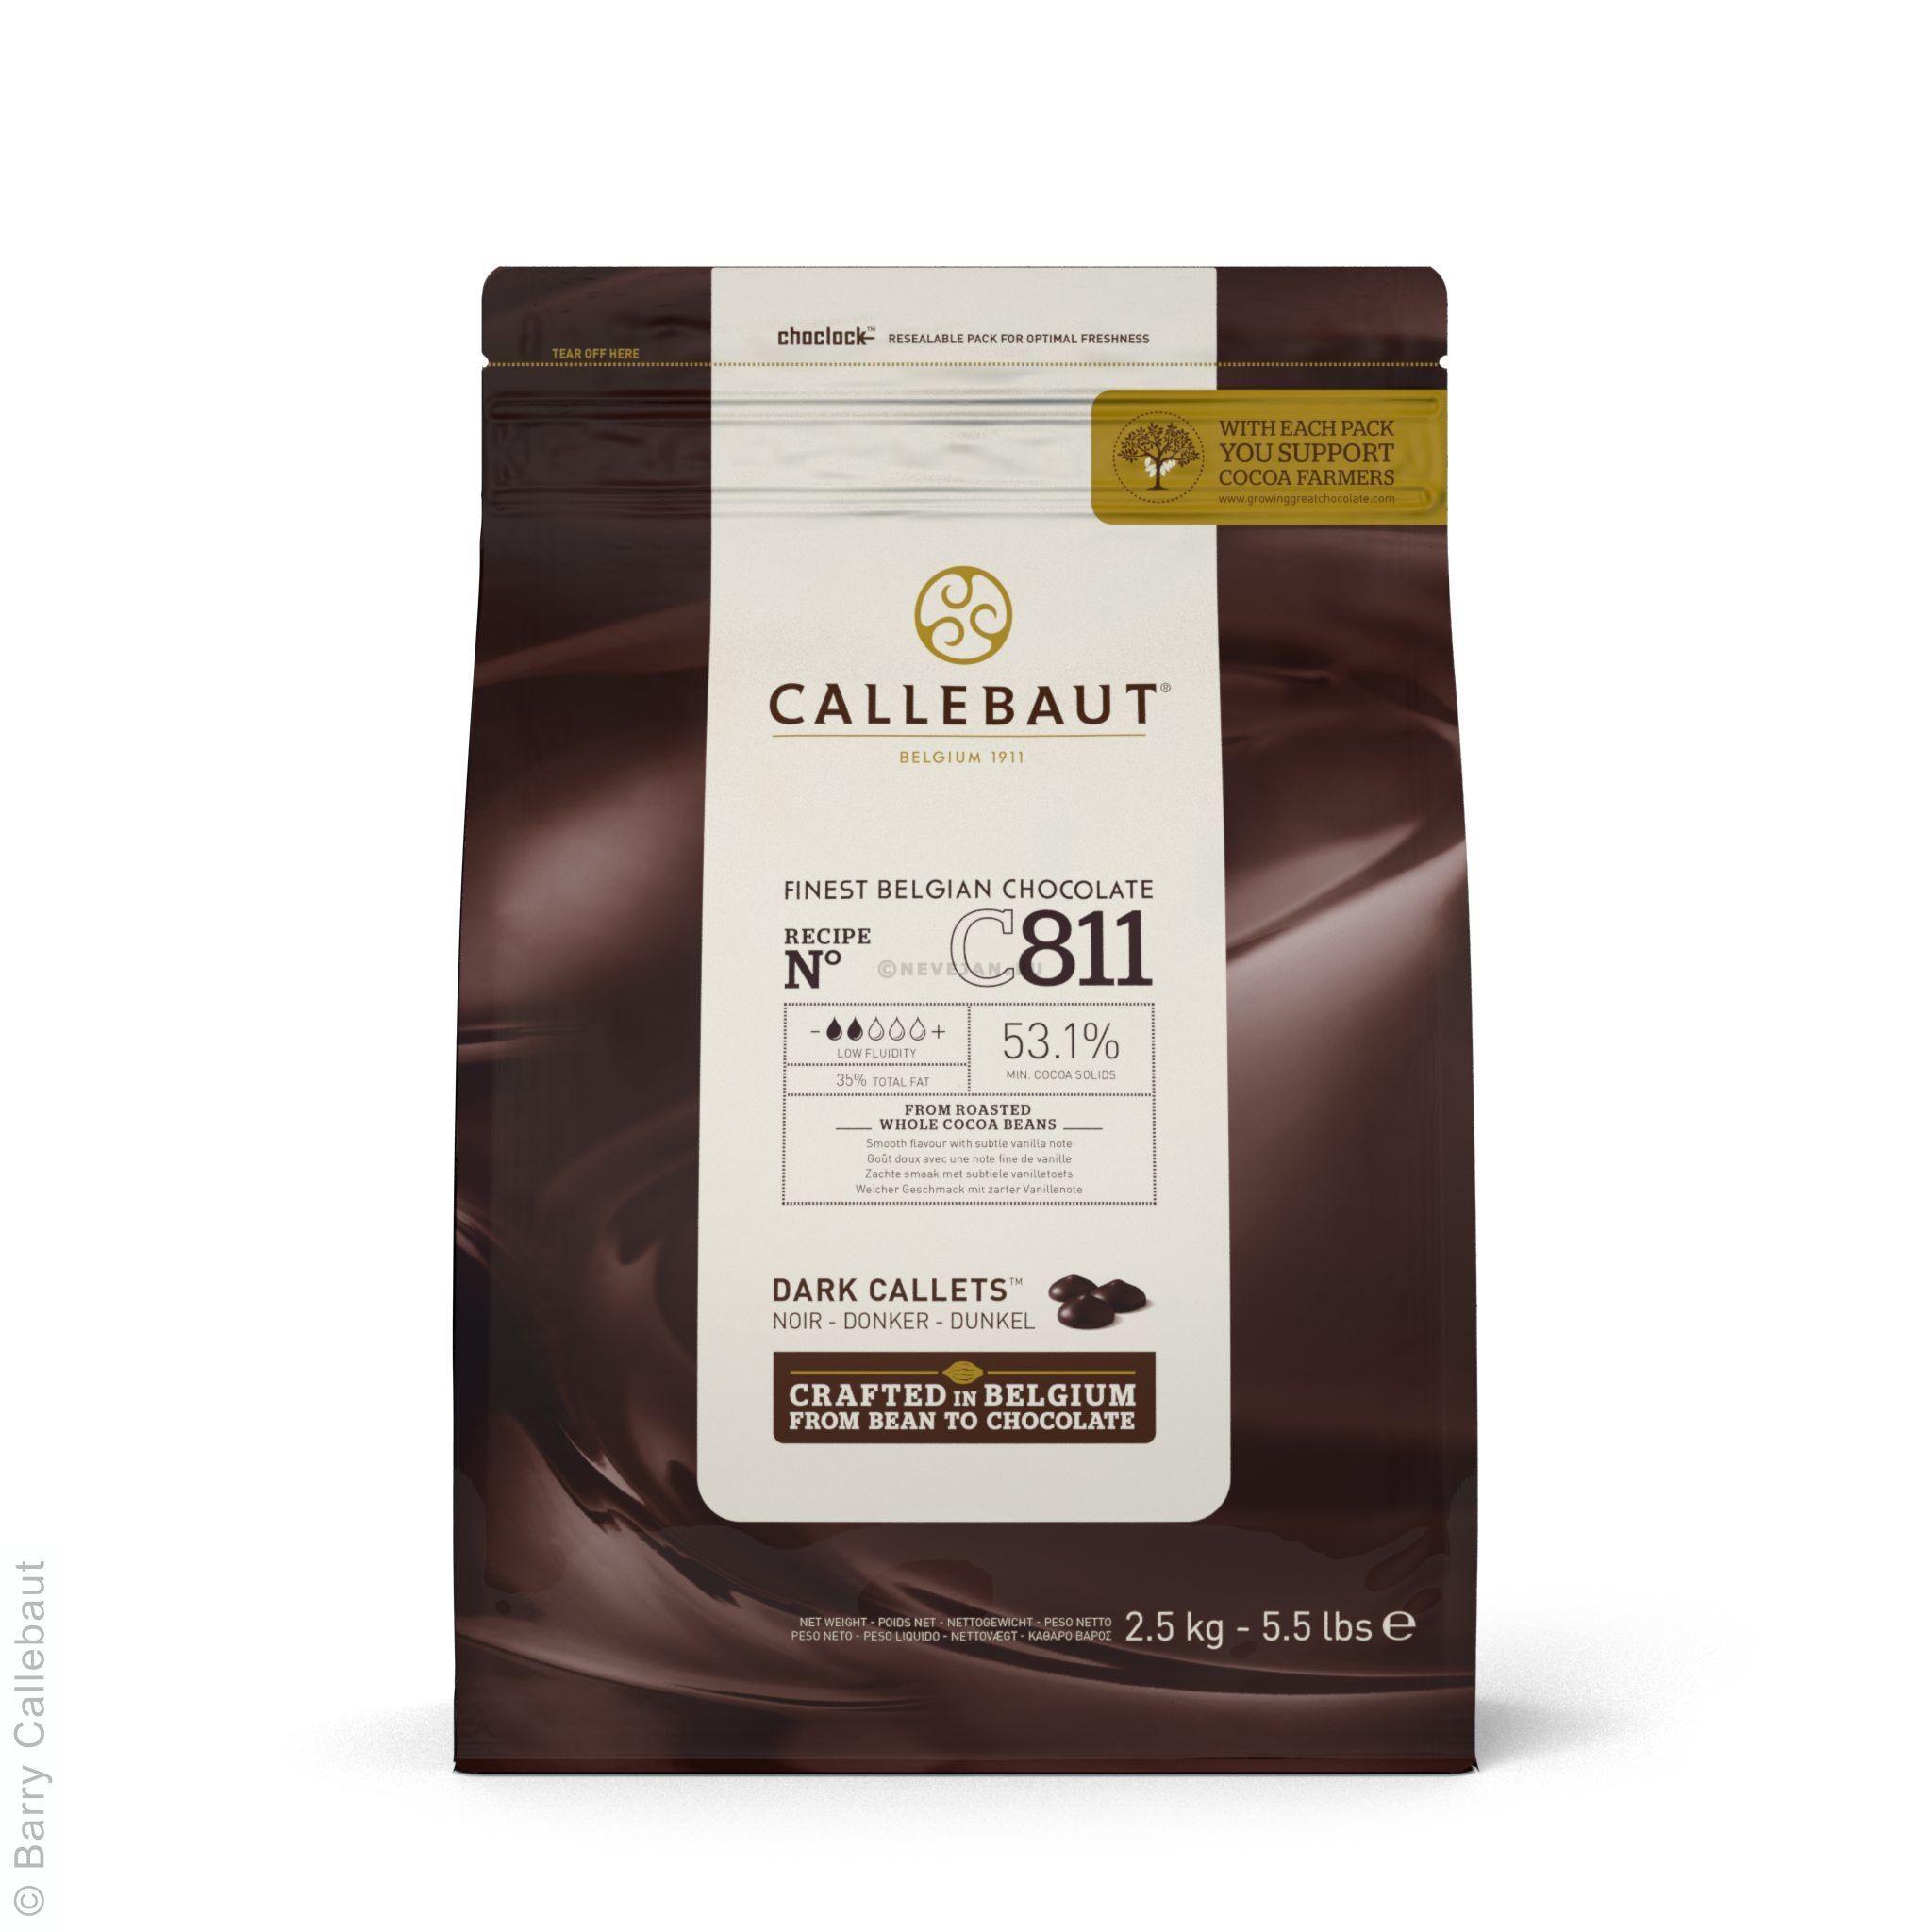 Barry Callebaut chocolat pastilles C811 fondant 2.5kg